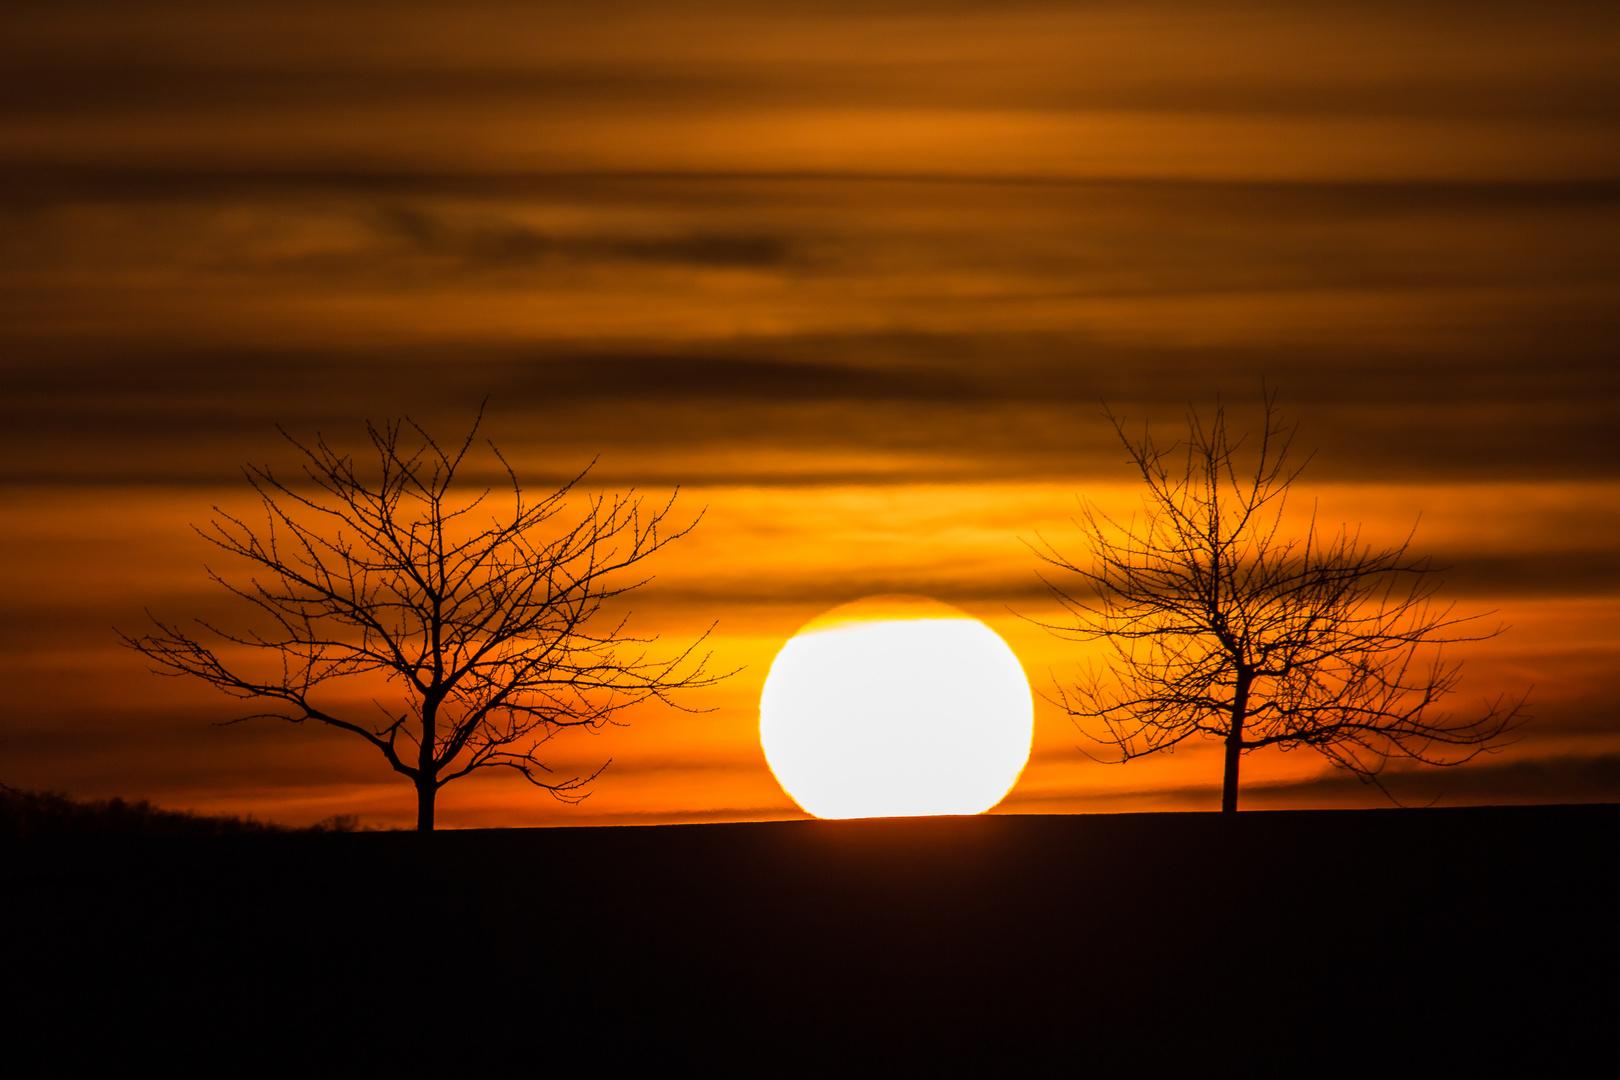 Sonnenuntergang im Eichsfeld